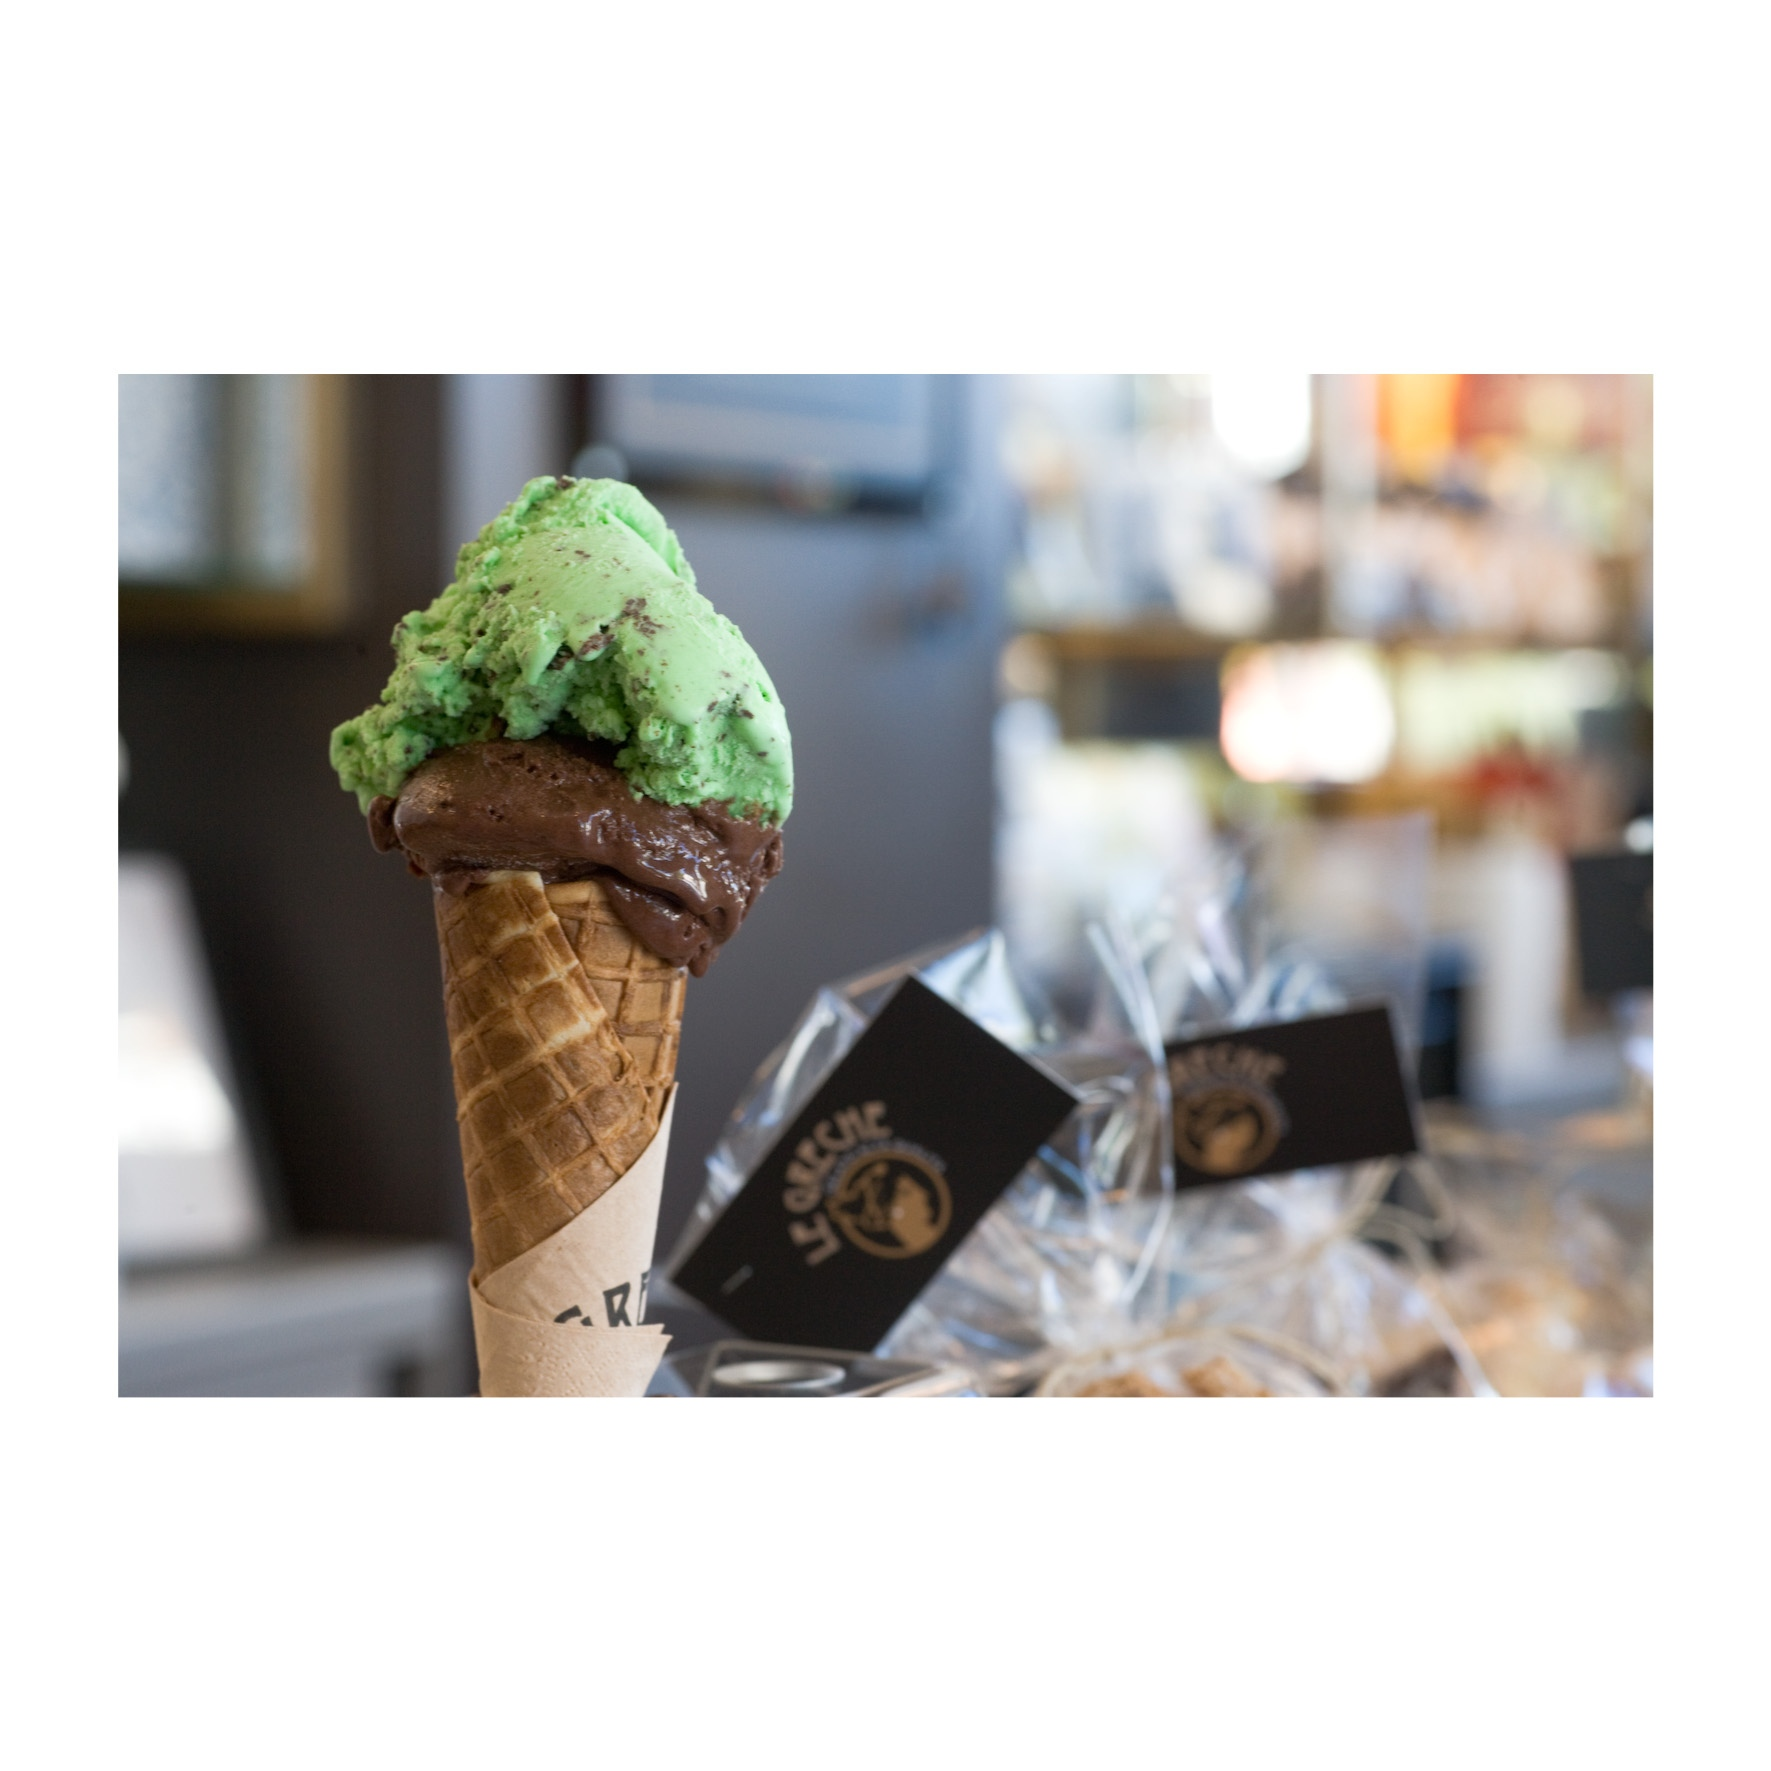 Le Greche: Βρήκαμε πού θα φας το πιο ωραίο παρφέ παγωτό της πόλης